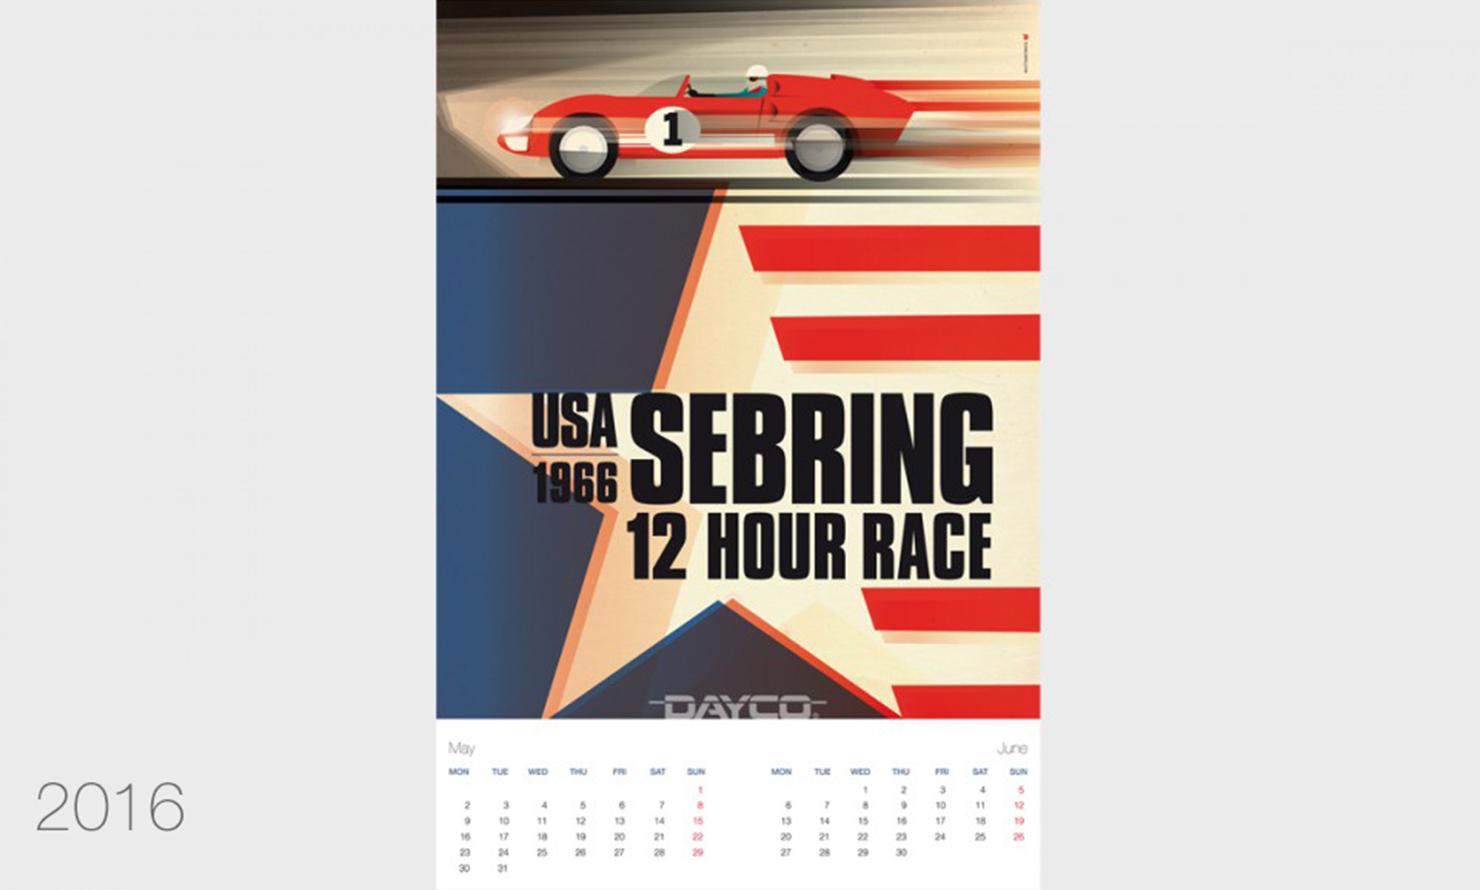 https://www.kubelibre.com/uploads/Slider-work-tutti-clienti/dayco-calendario-2016-3.jpg